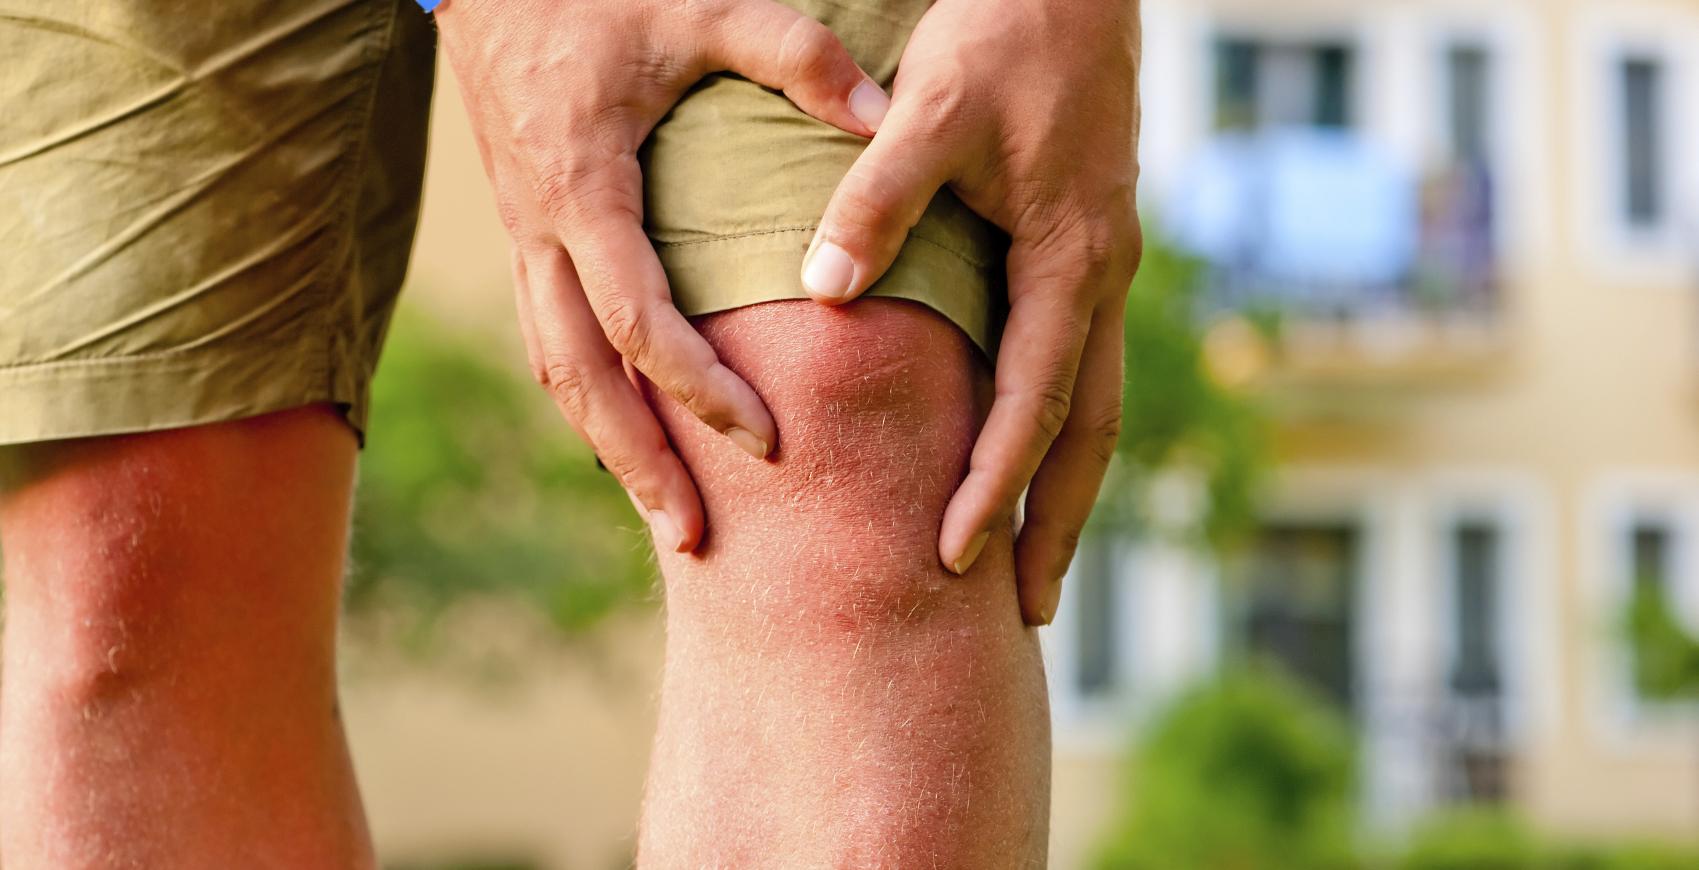 Артроз коленного сустава может привести к тяжелой инвалидности